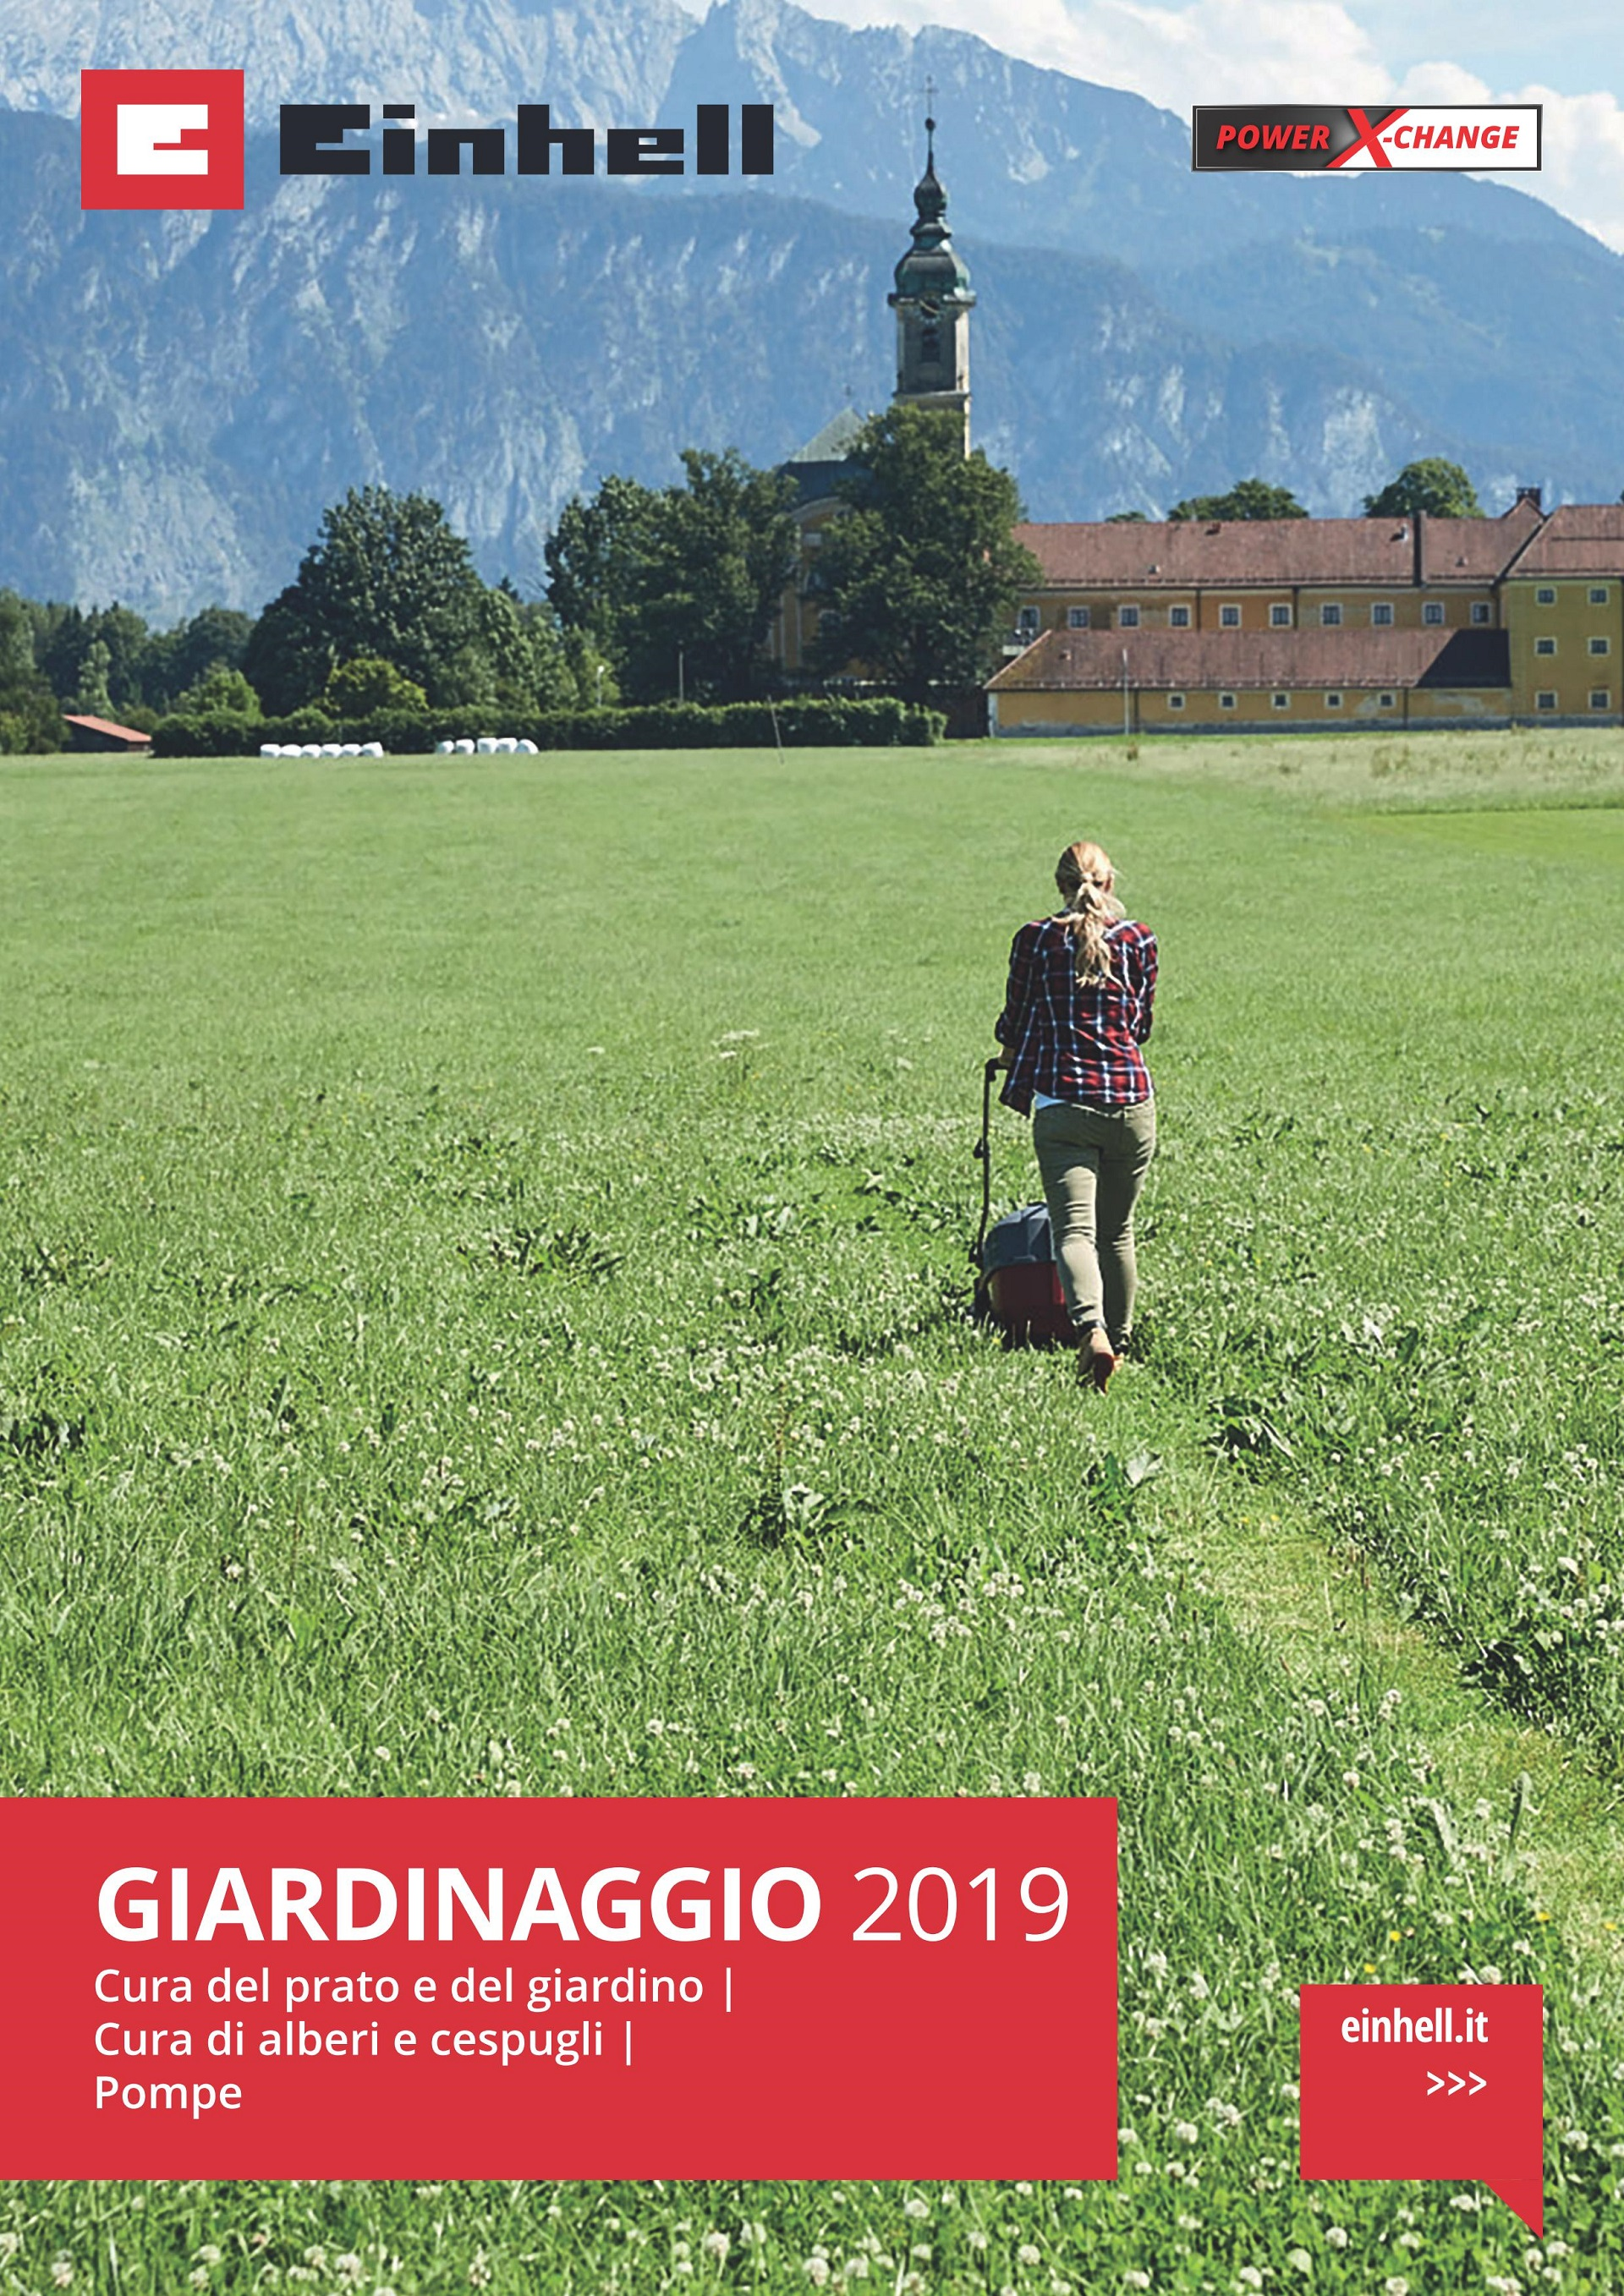 copertina Gardinaggio 2019